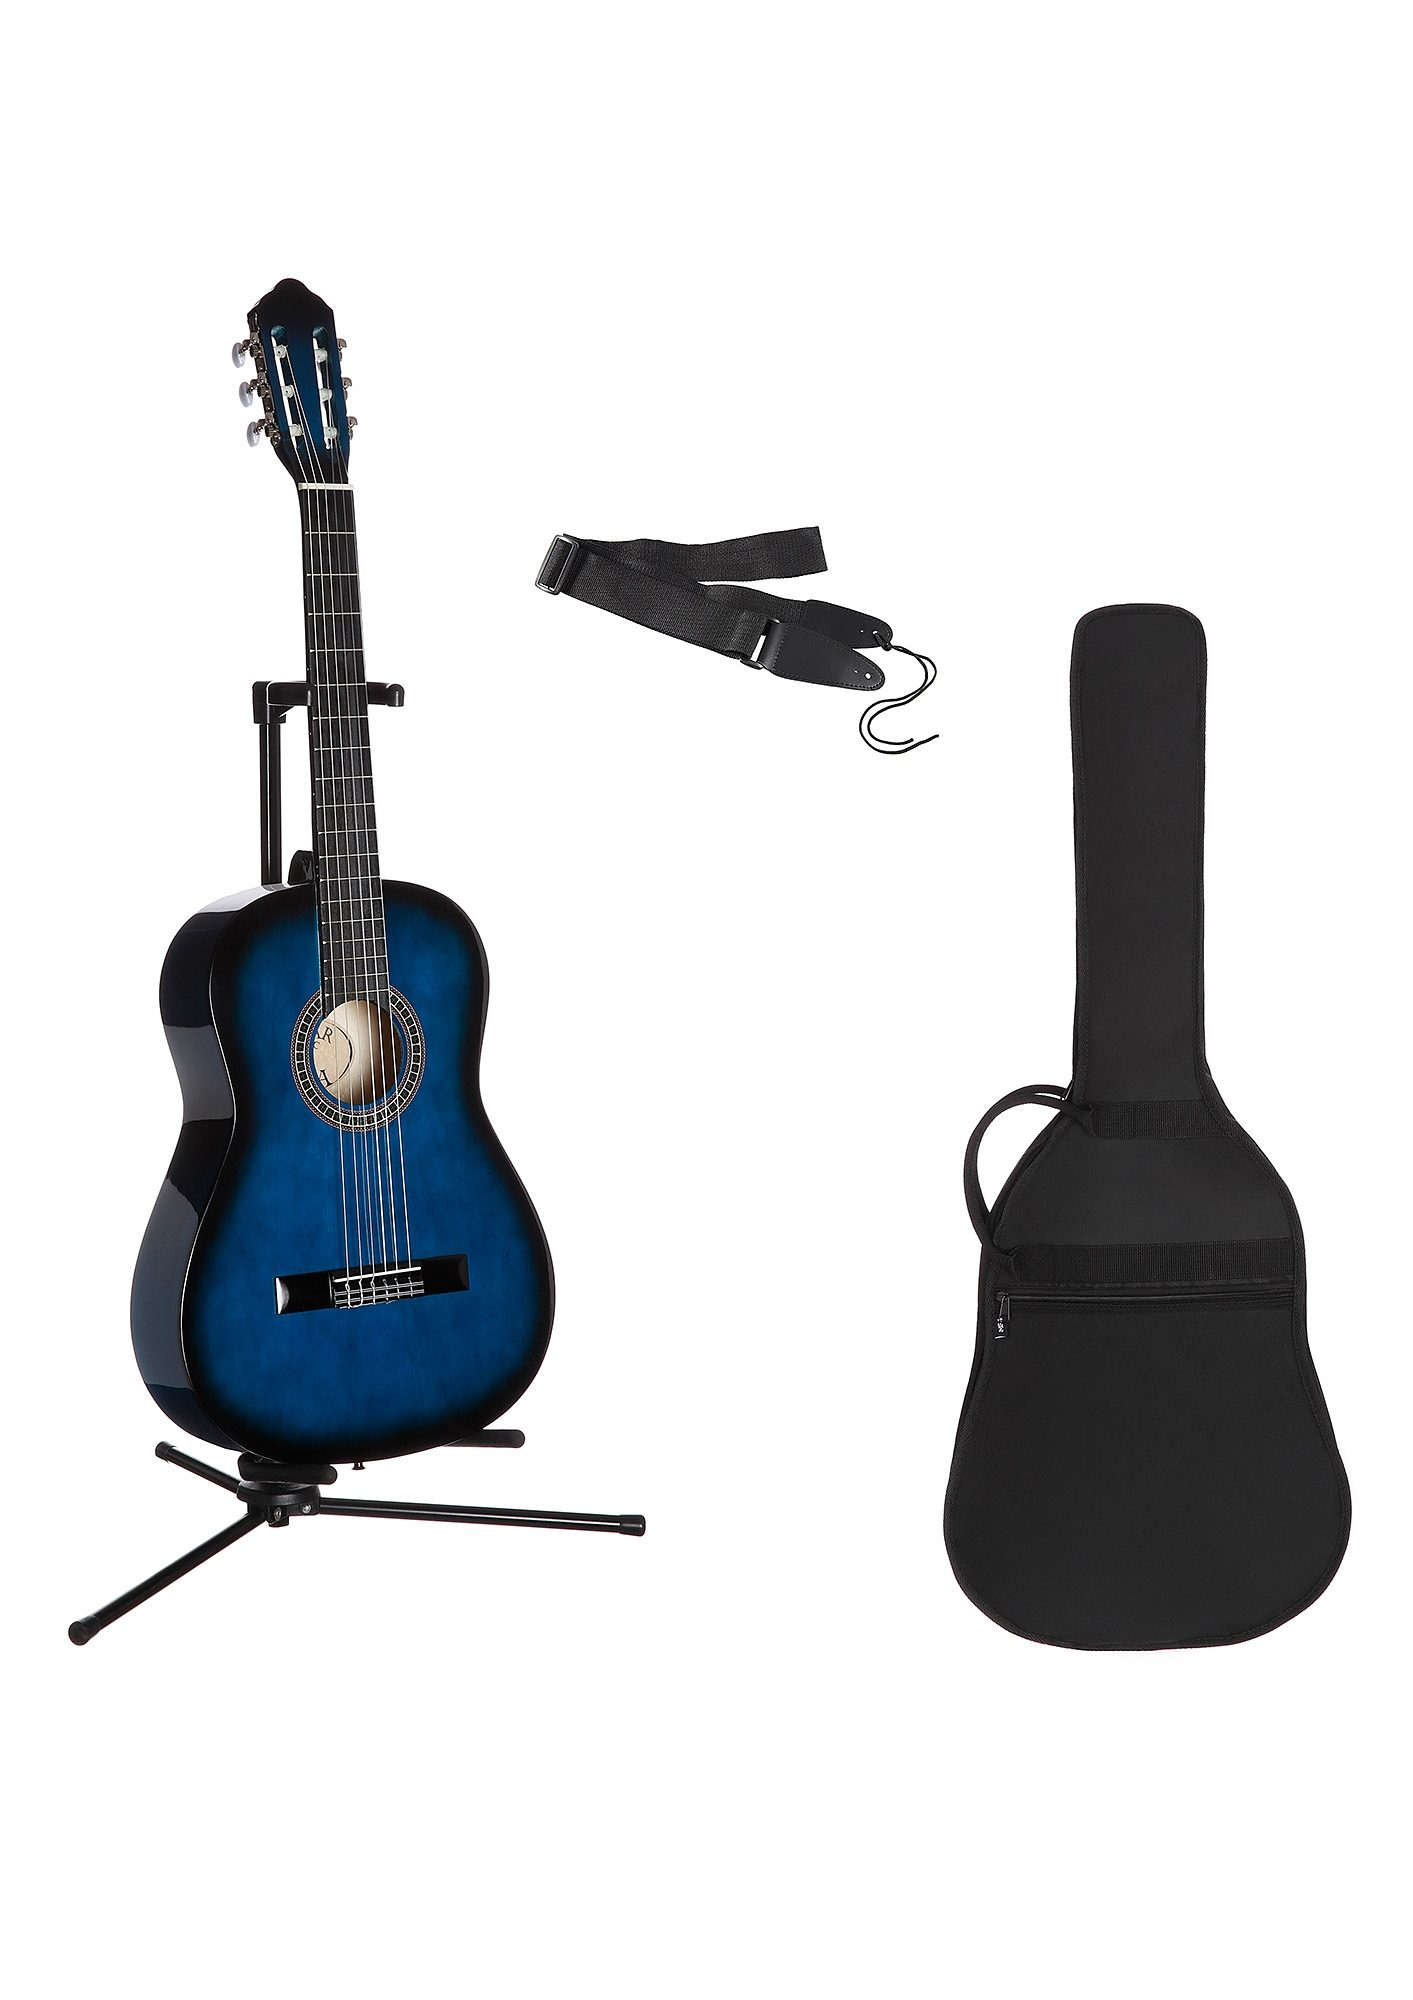 Gitarrenset Konzertgitarre, 1/4, inkl. Gitarrentasche und Gitarrengurt blau Gitarre Musikinstrumente